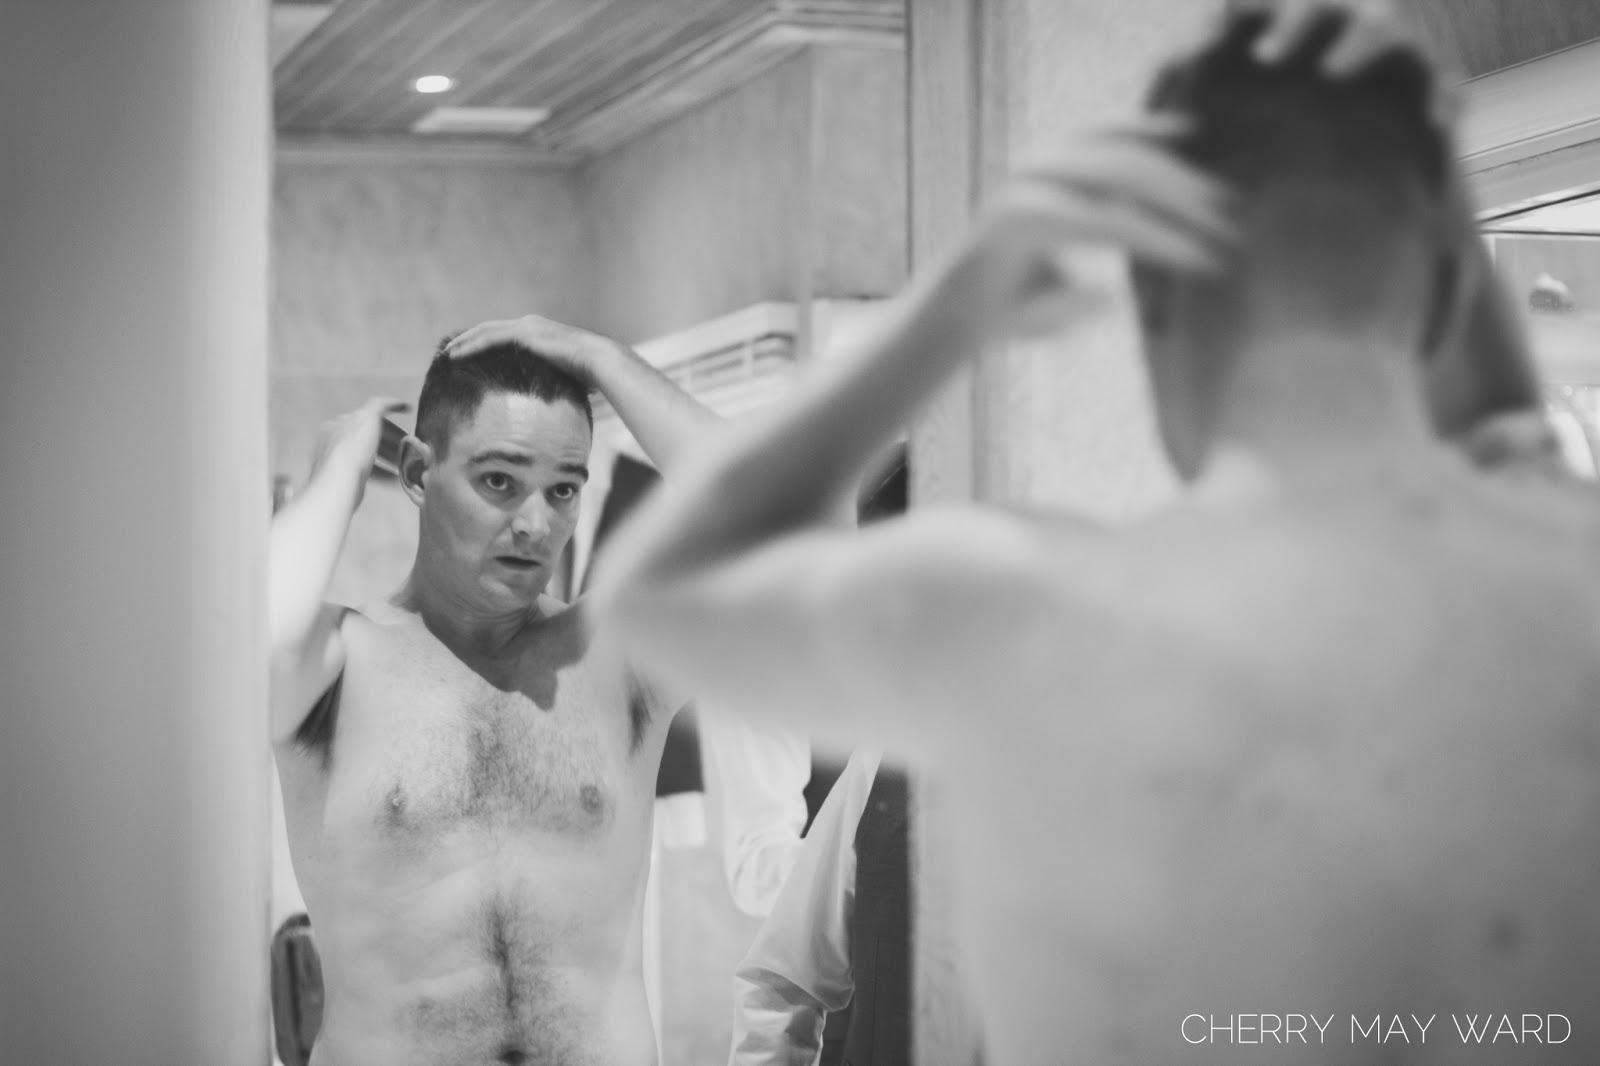 groom getting ready, groom putting gel in his hair, looking into mirror, Koh Samui professional wedding photographer, thailand wedding photos.